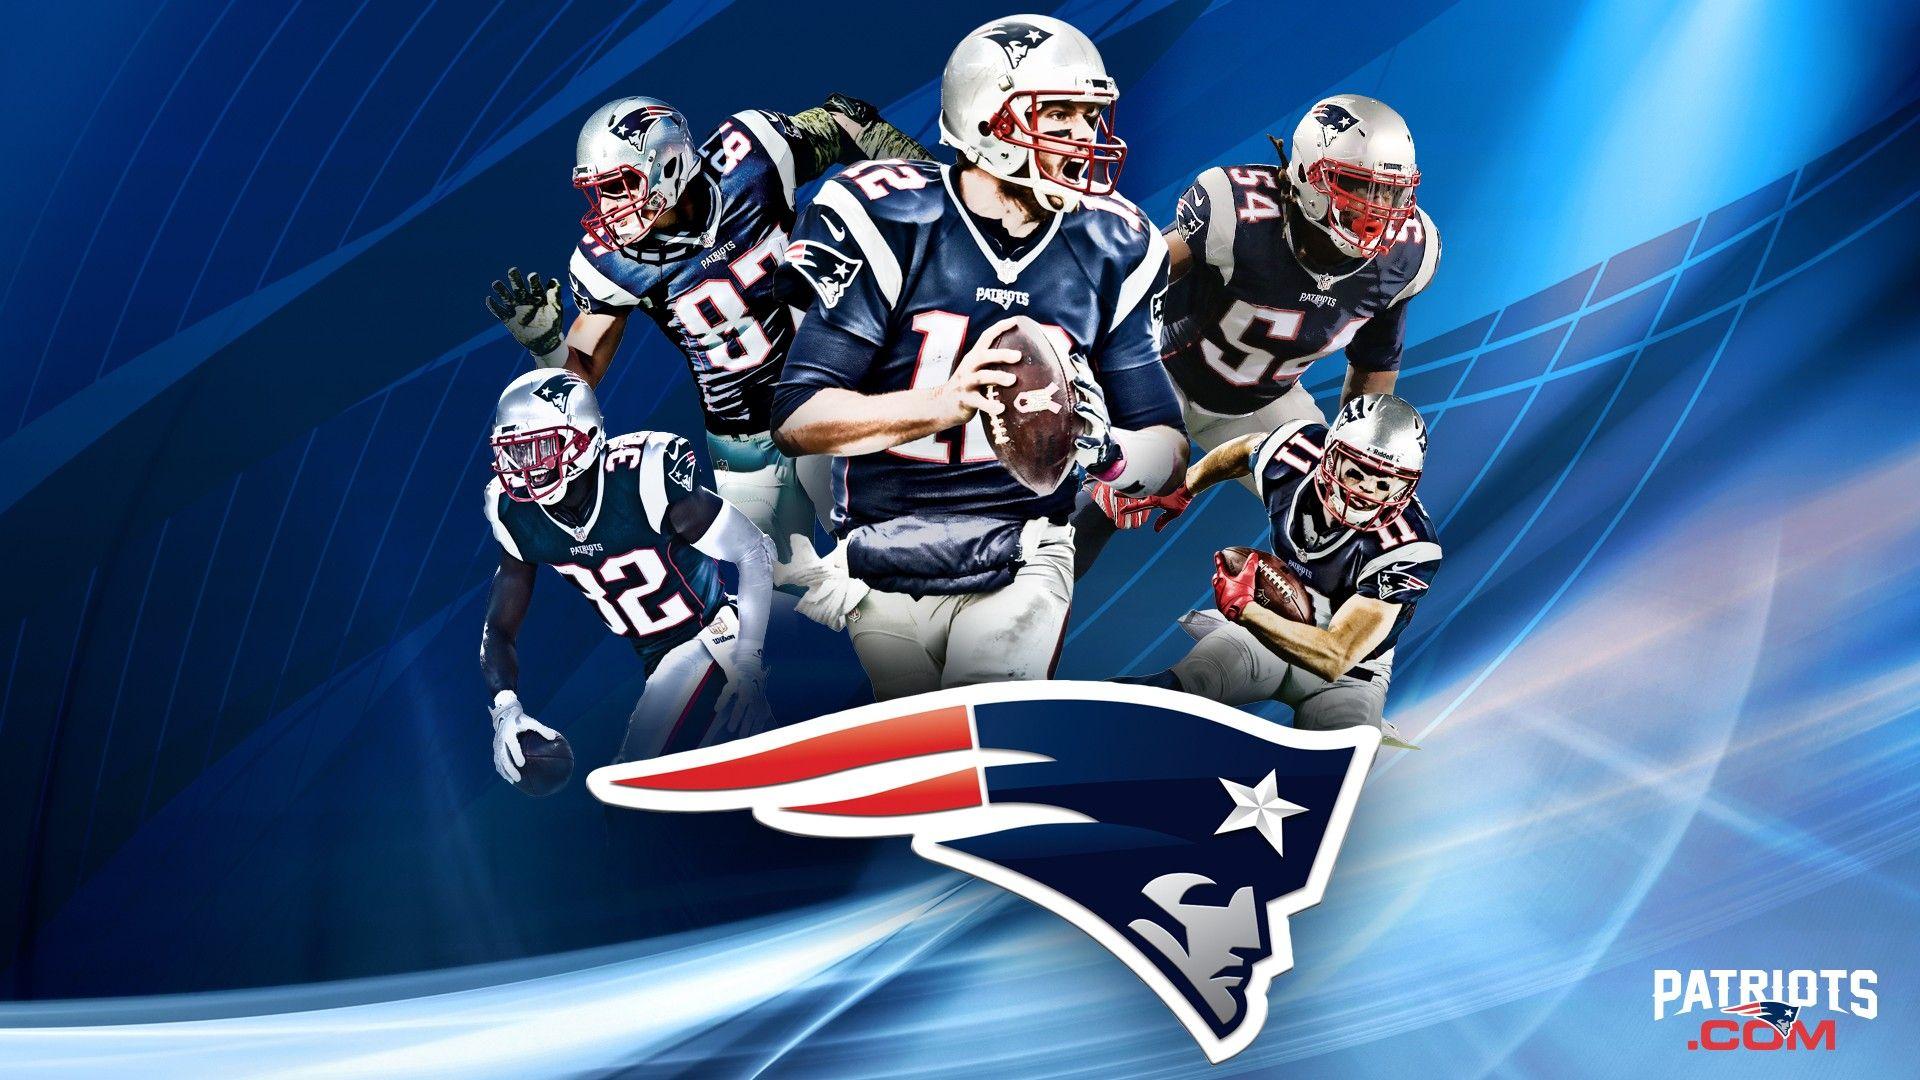 New England Patriots For Desktop Wallpaper 2021 Nfl Football Wallpapers New England Patriots Wallpaper New England Patriots Logo New England Patriots